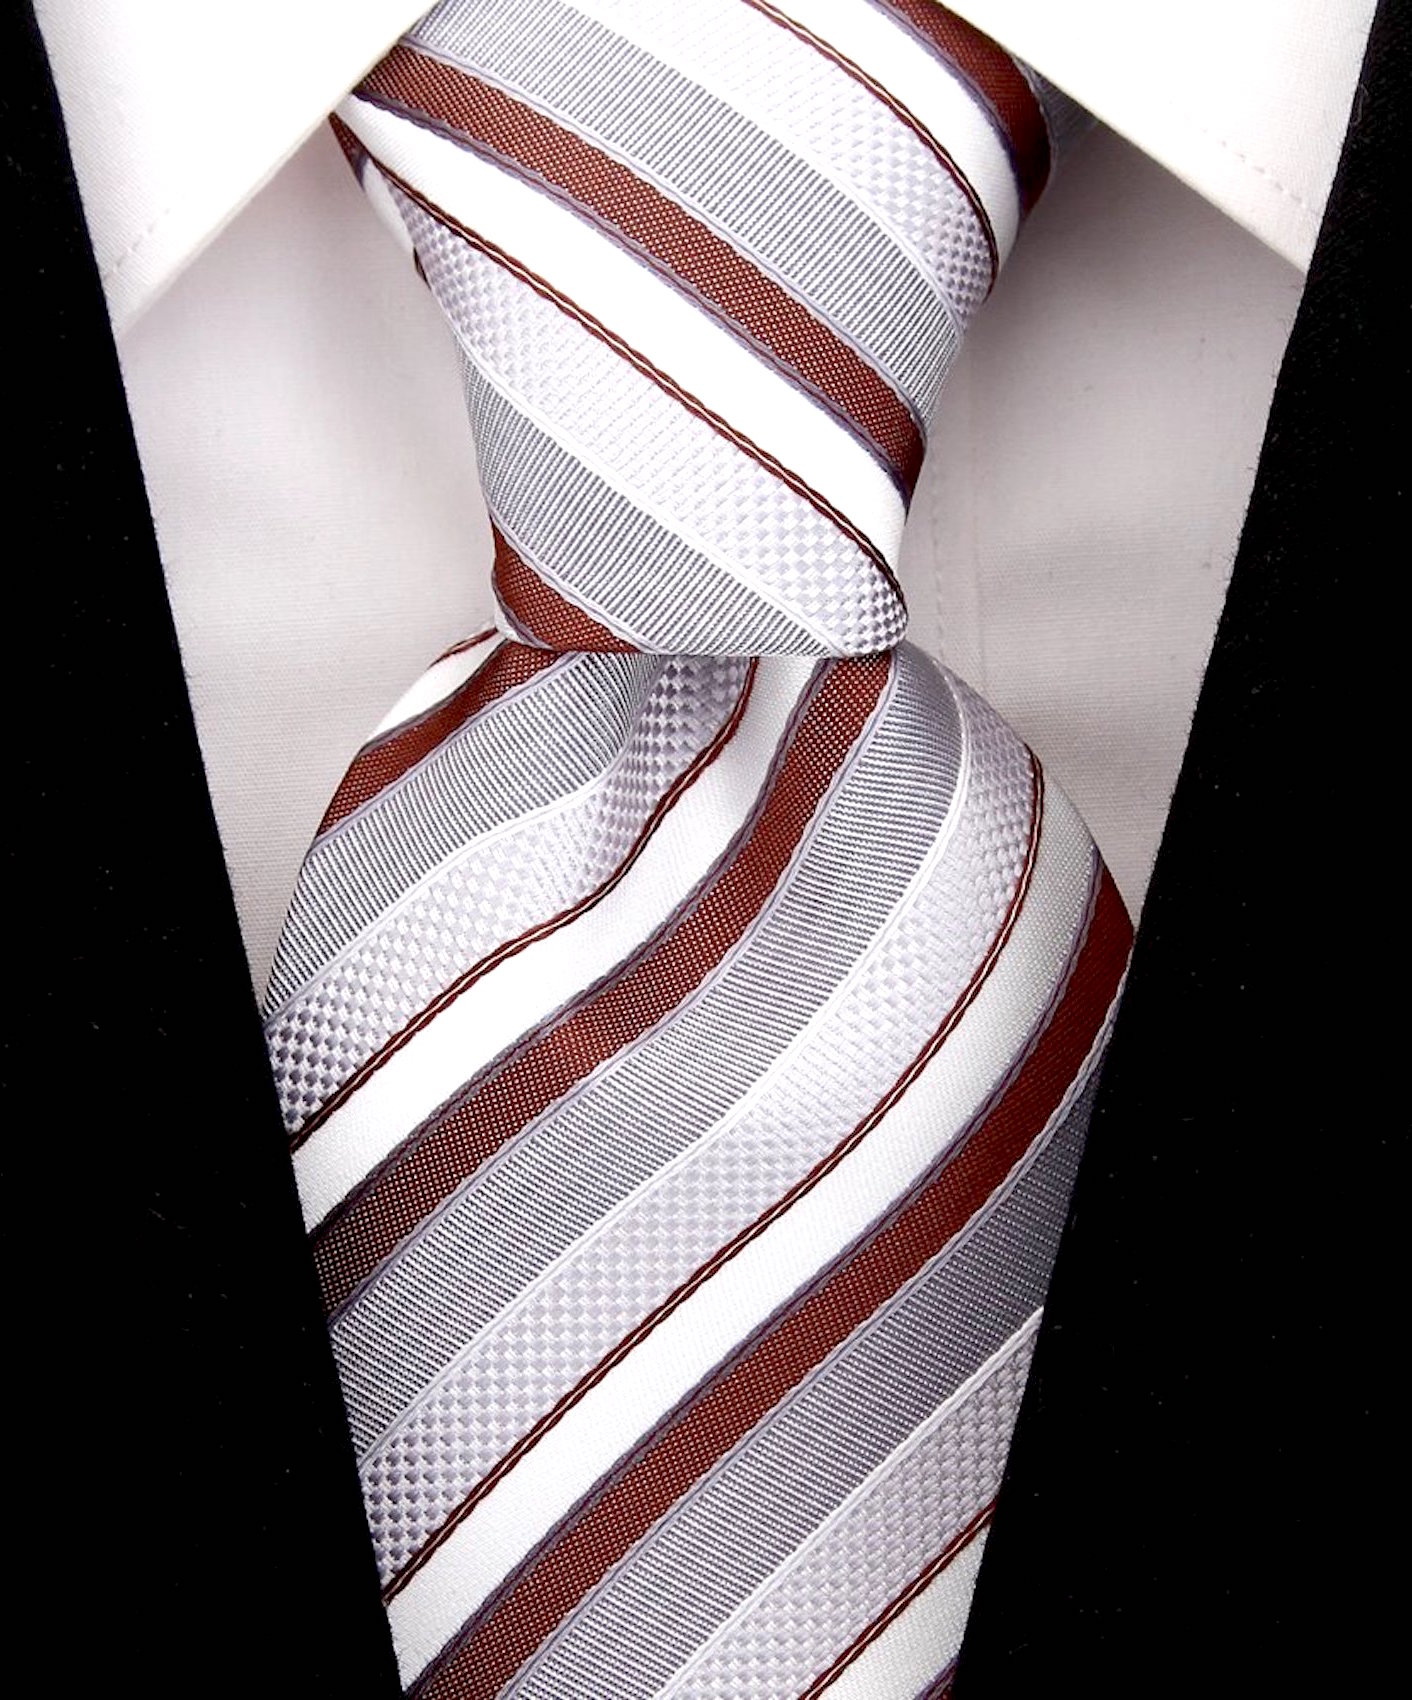 Scott-Allan-Striped-Necktie-Mens-Ties-in-Various-Colors thumbnail 7